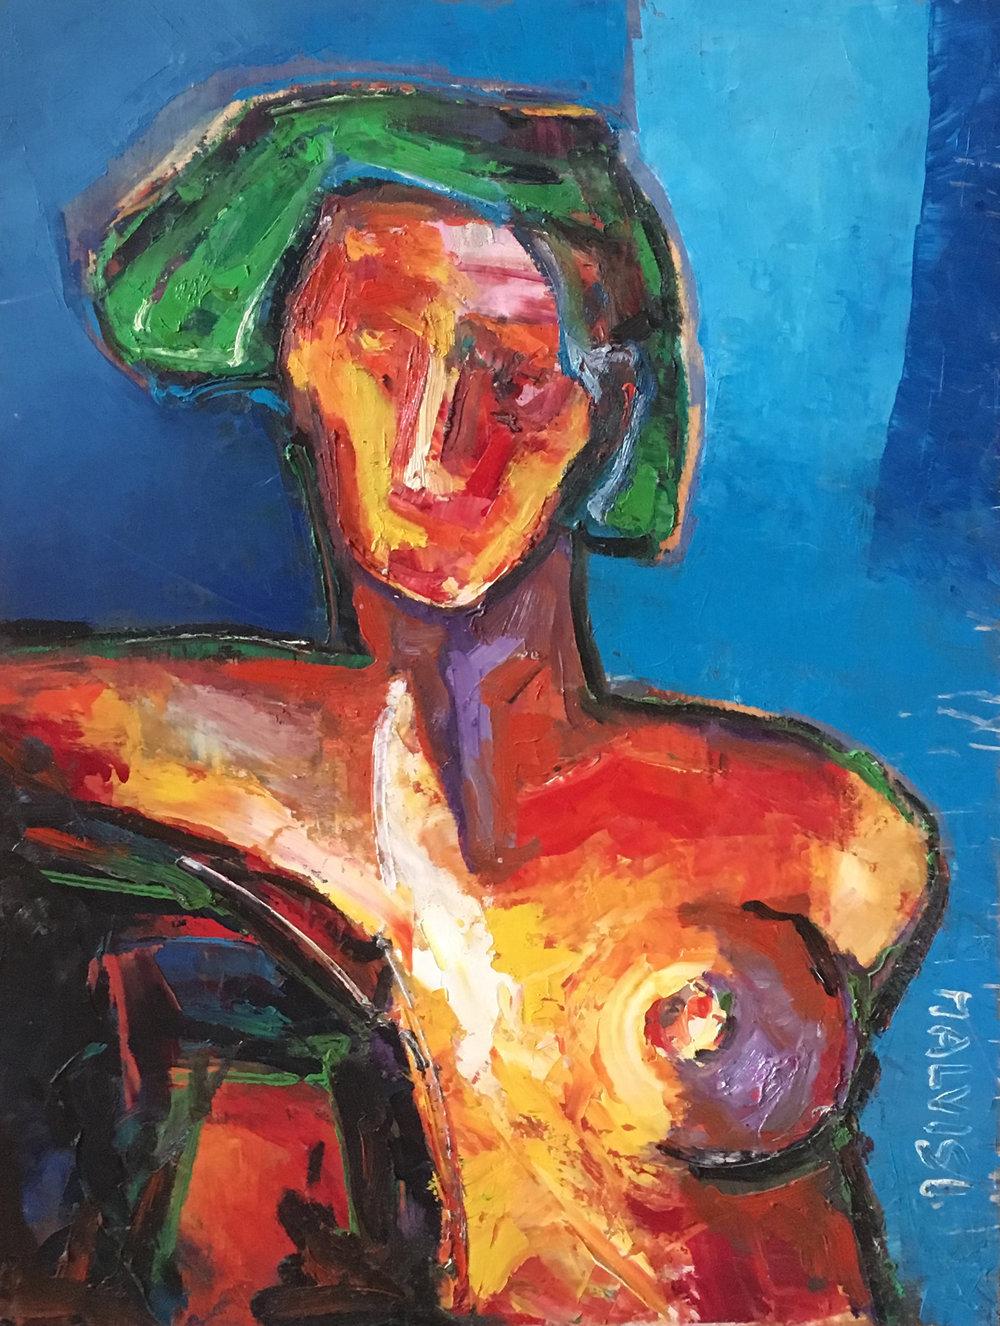 <b>Woman</b><br> 2001 Oil on wood <br> cm 50 x 70